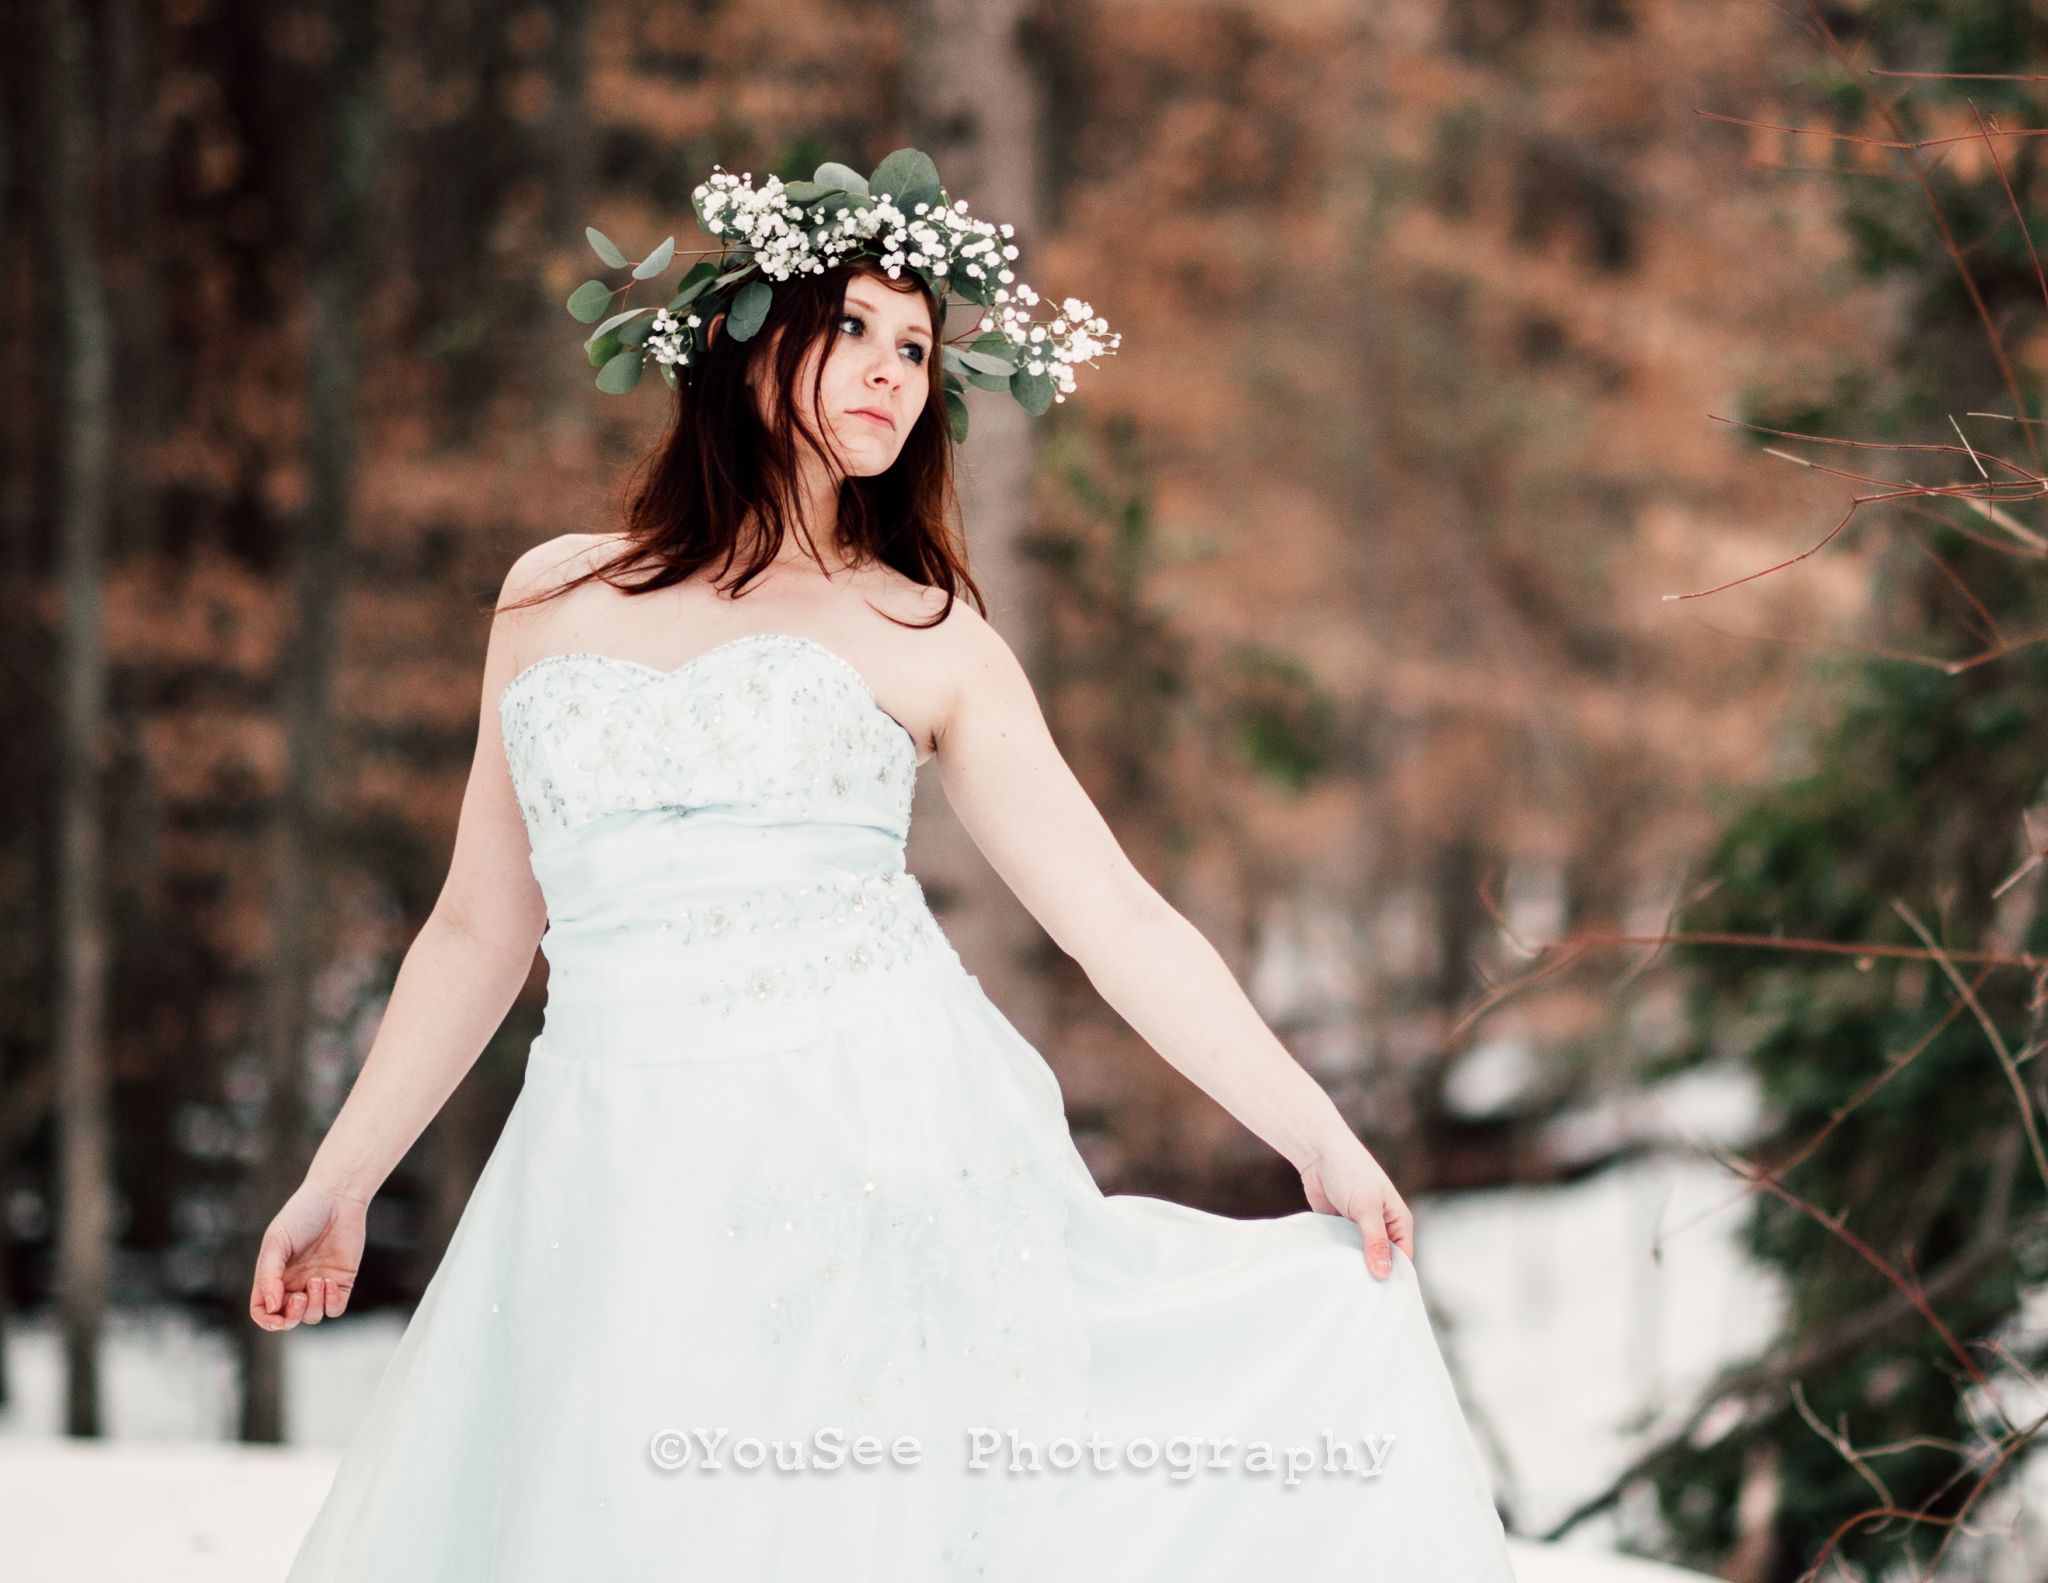 seniorportrait_fredericksburg_photography_winter2 (34)